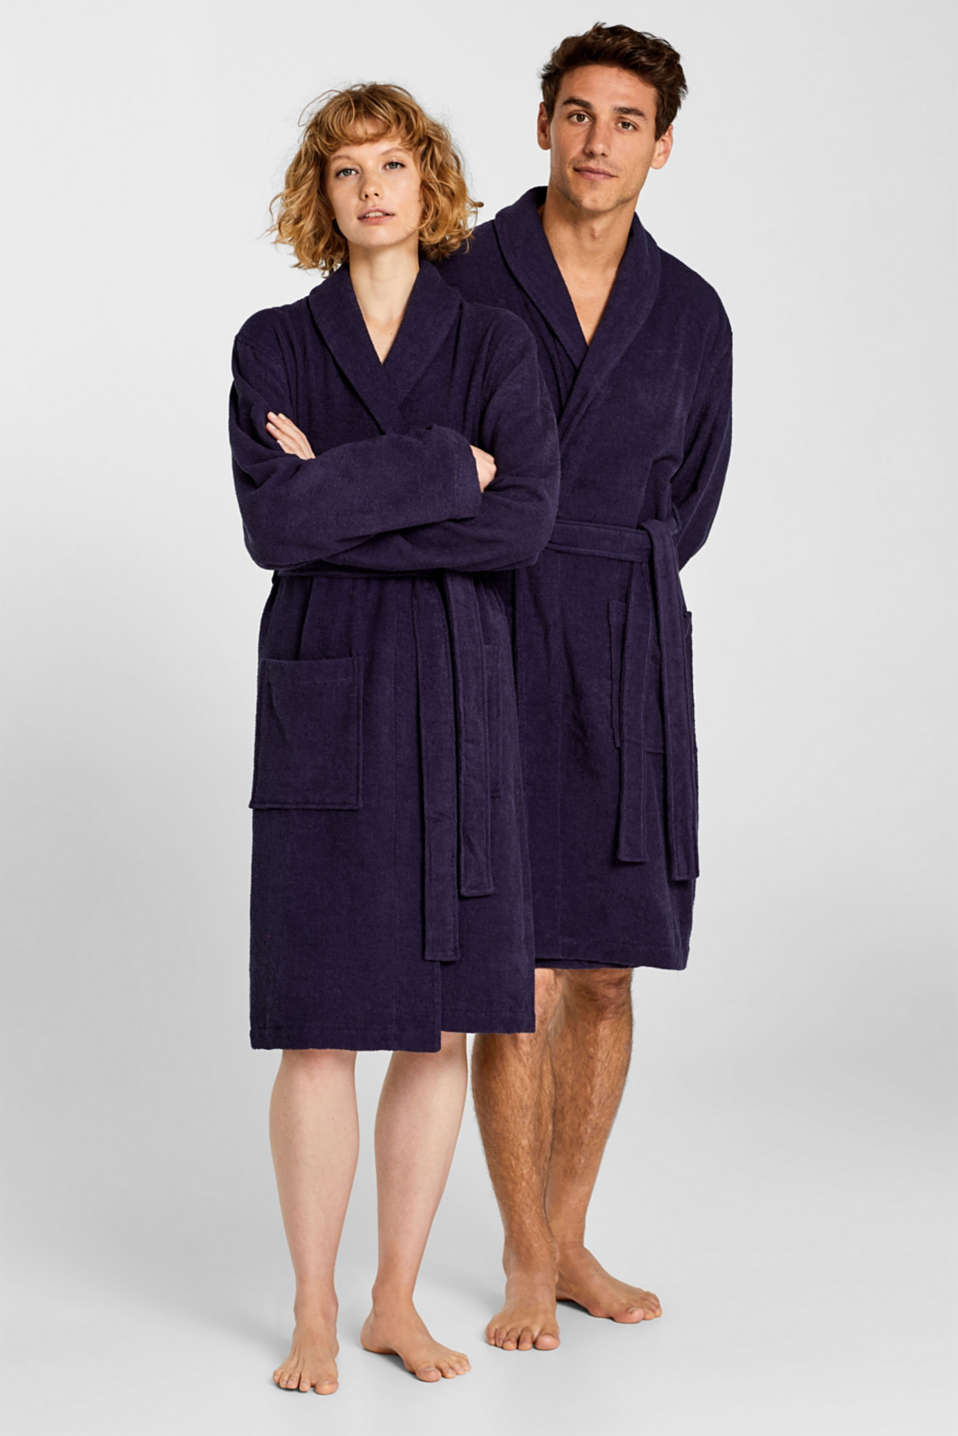 Unisex swimsuit, 100% cotton, NAVY BLUE, detail image number 0